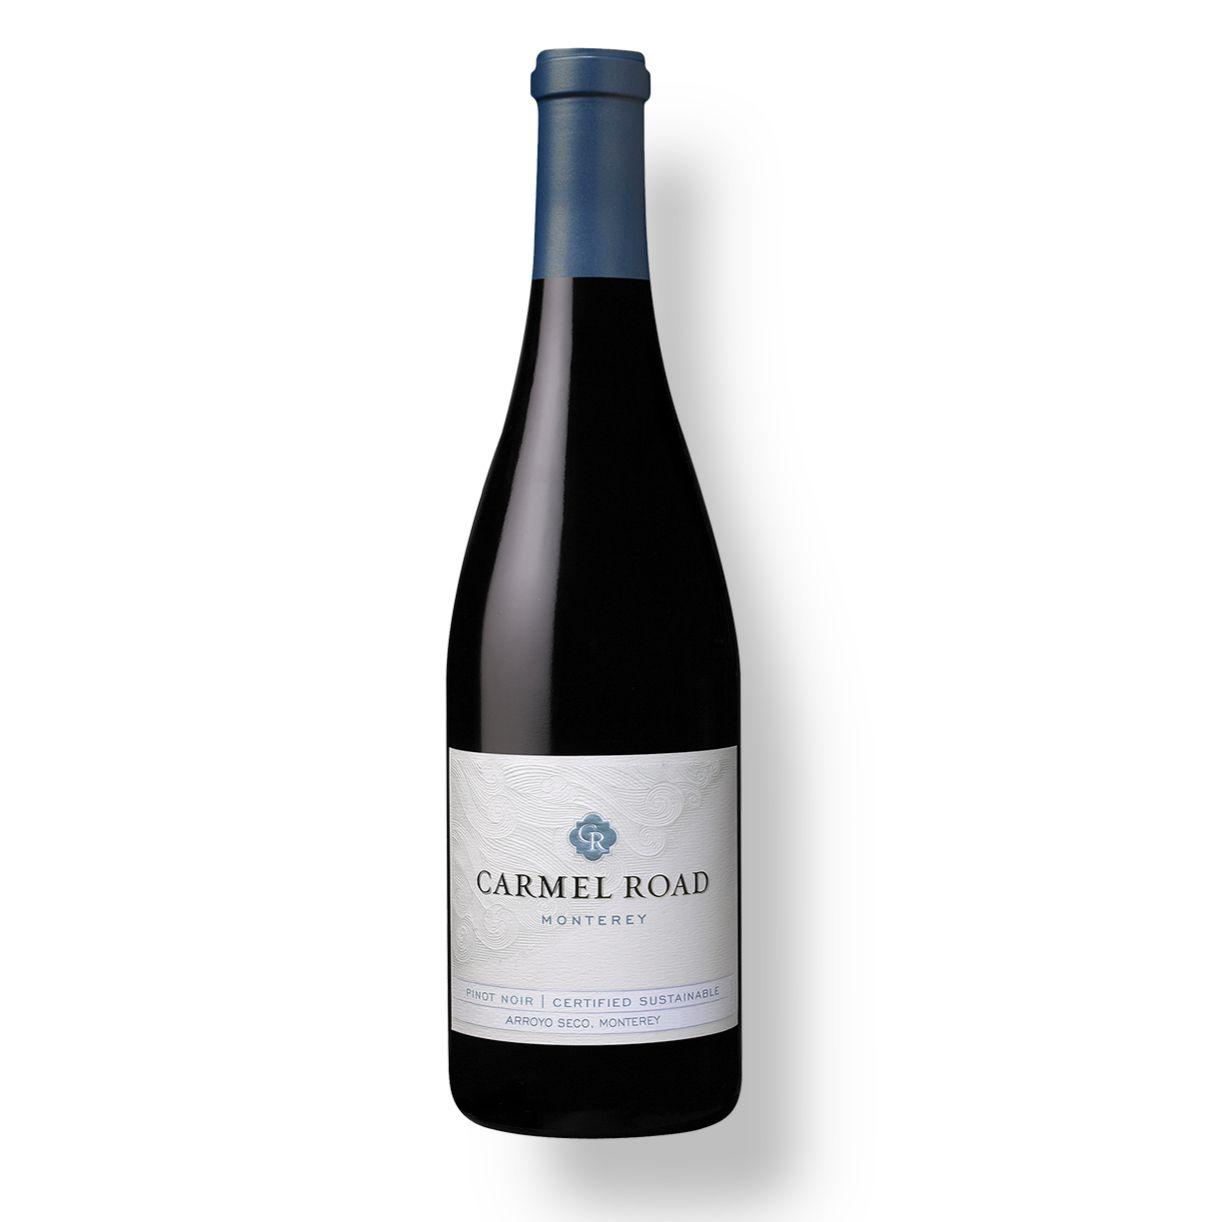 Carmel Road Monterey Pinot Noir 2016